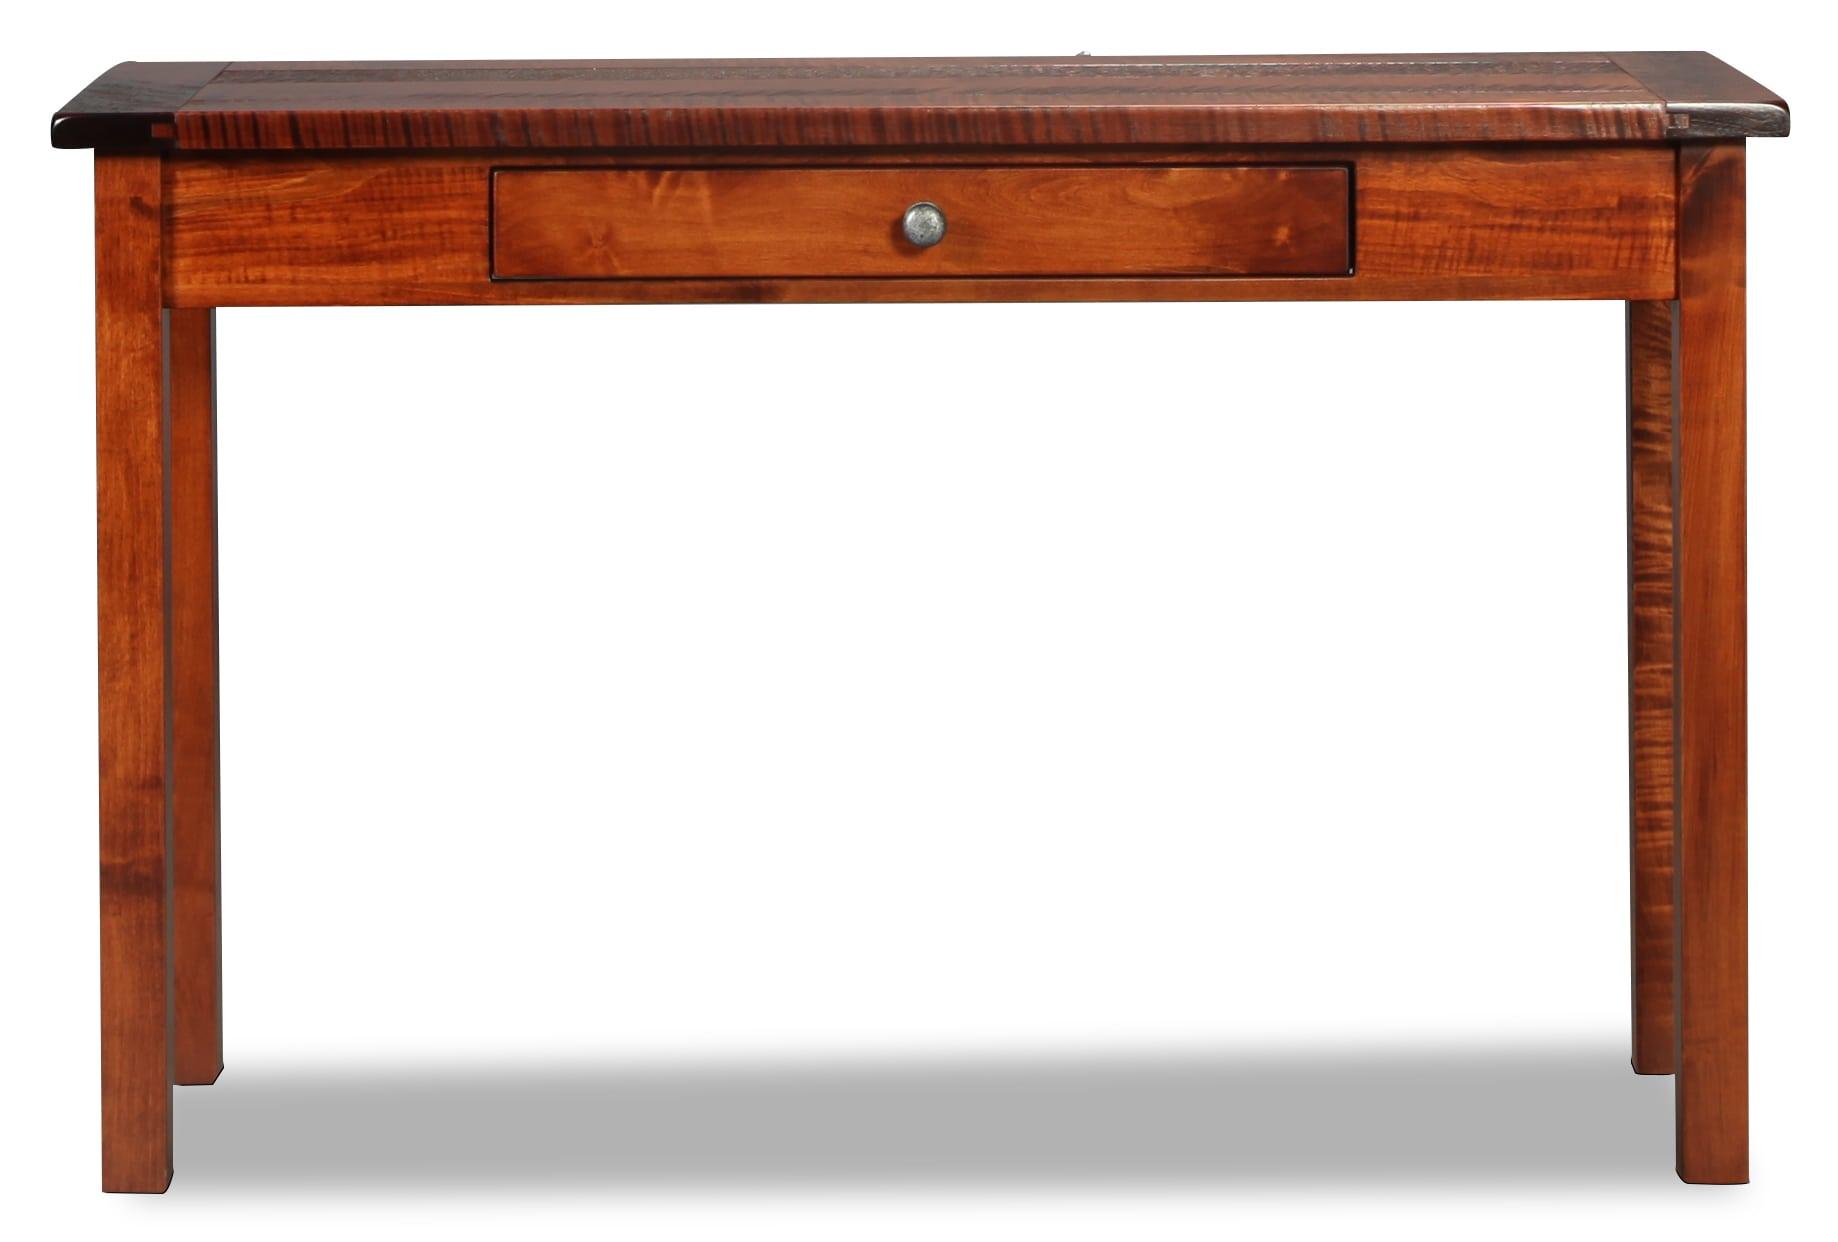 Farmerstown Sofa Table